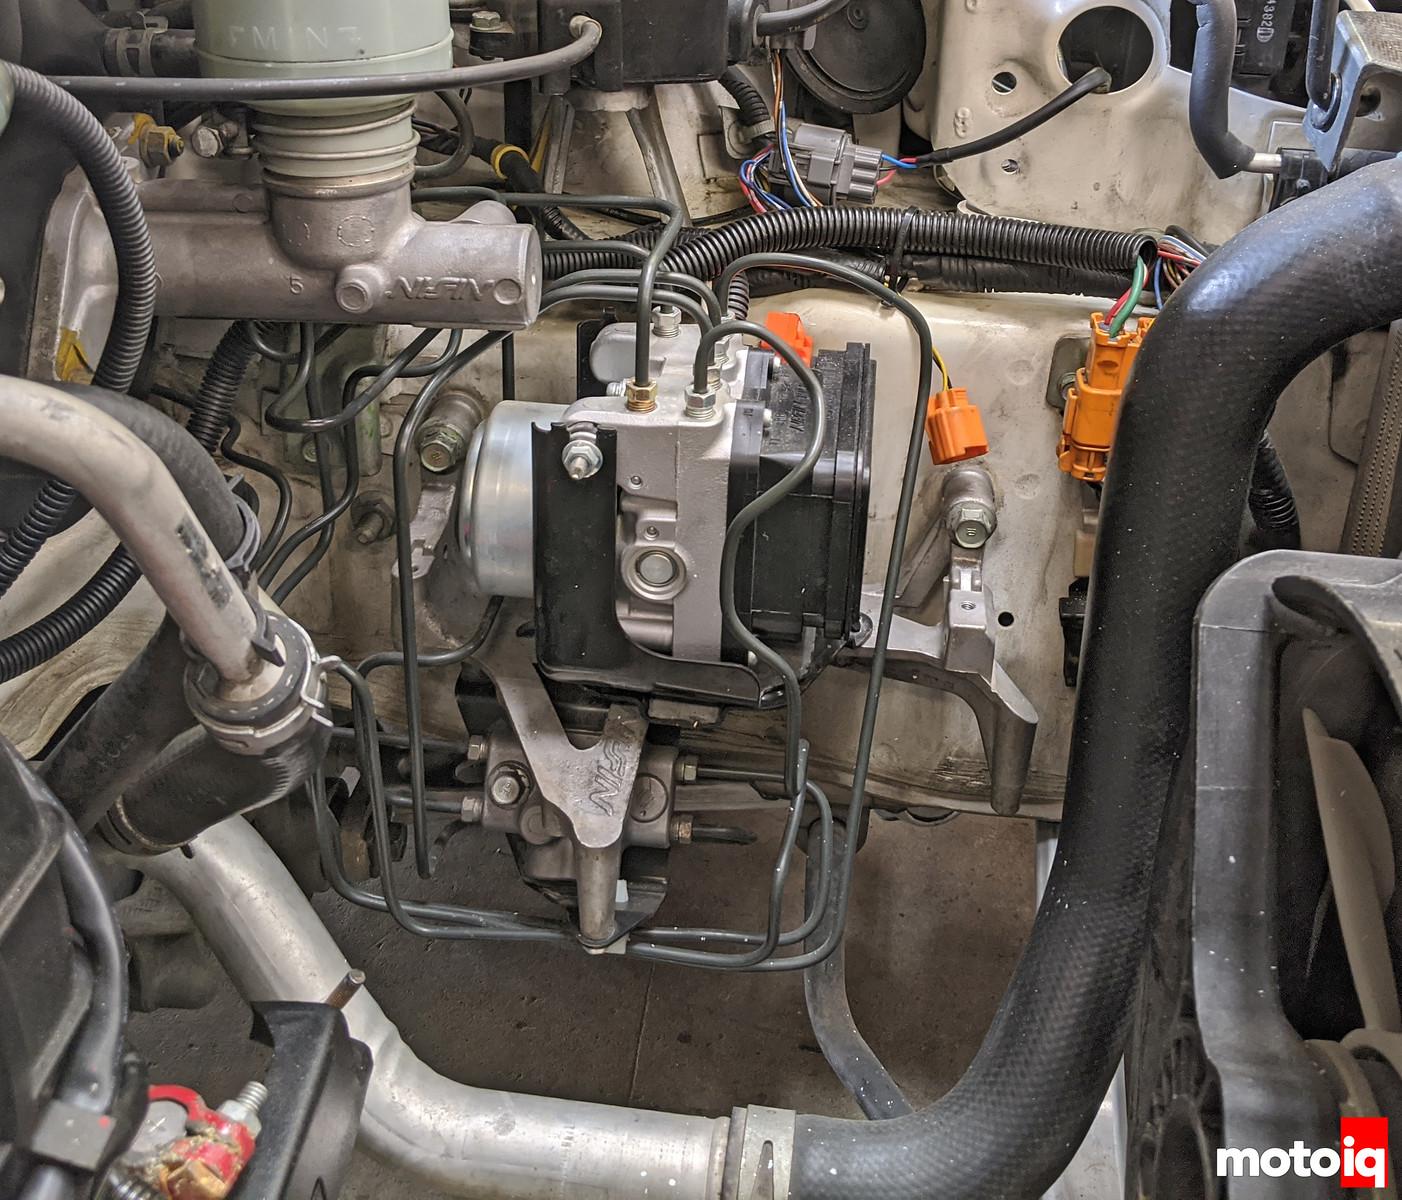 NSX 2000 ABS module upgrade